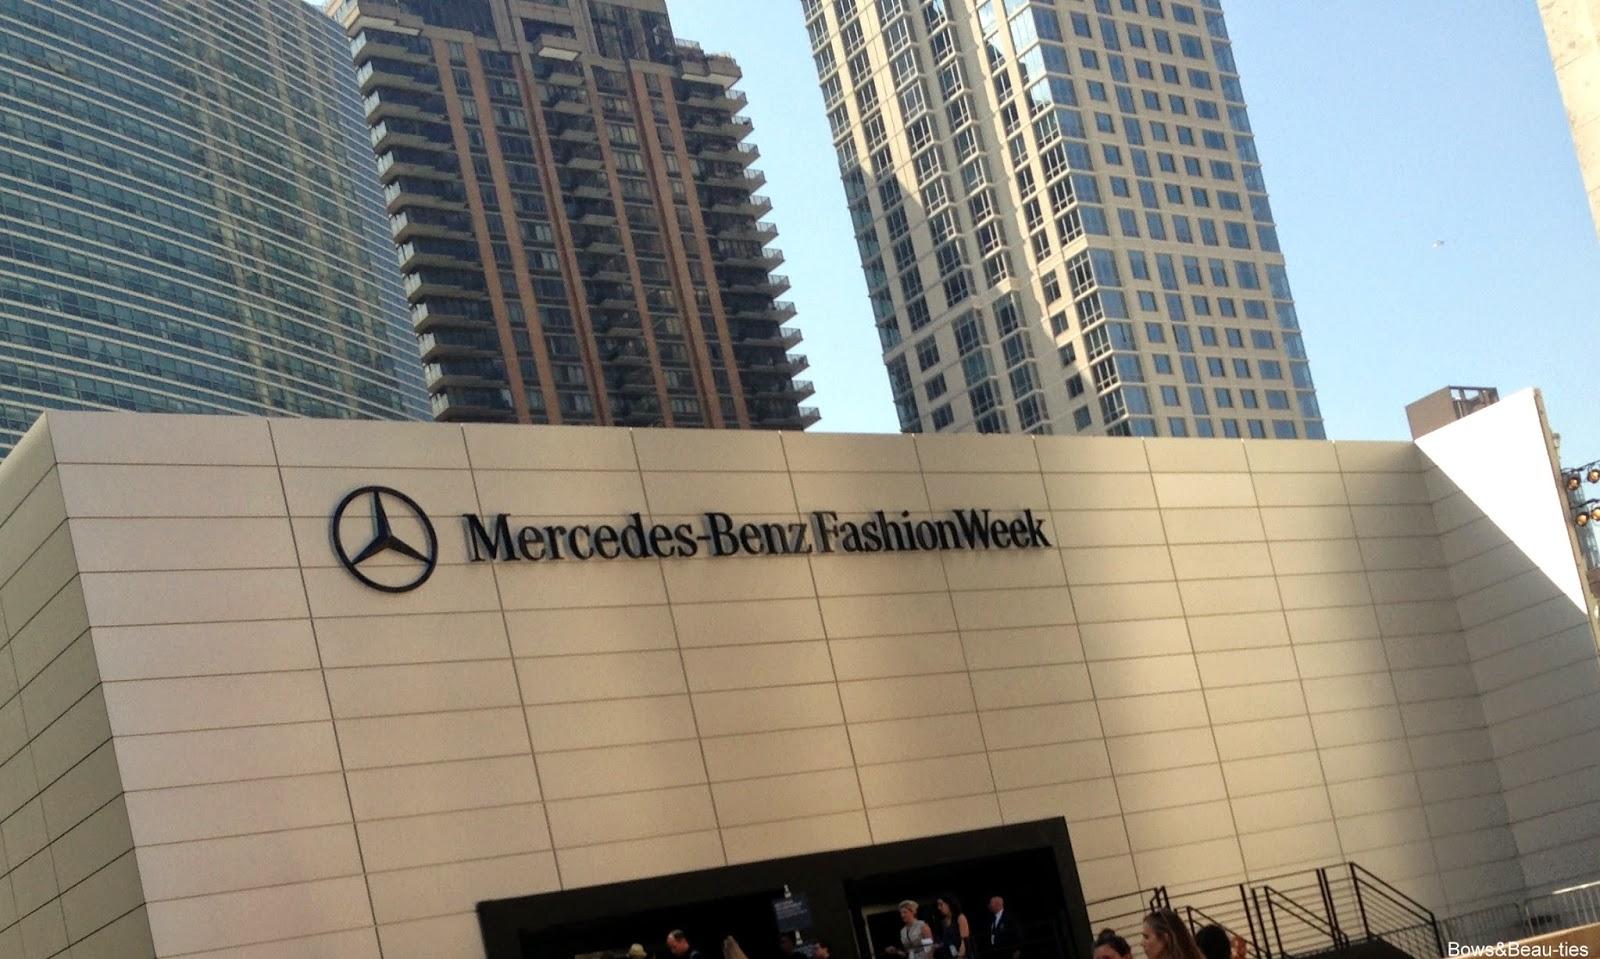 NYFW, Mercedes Benz, Bowsandbeau-ties, ss15, fashion